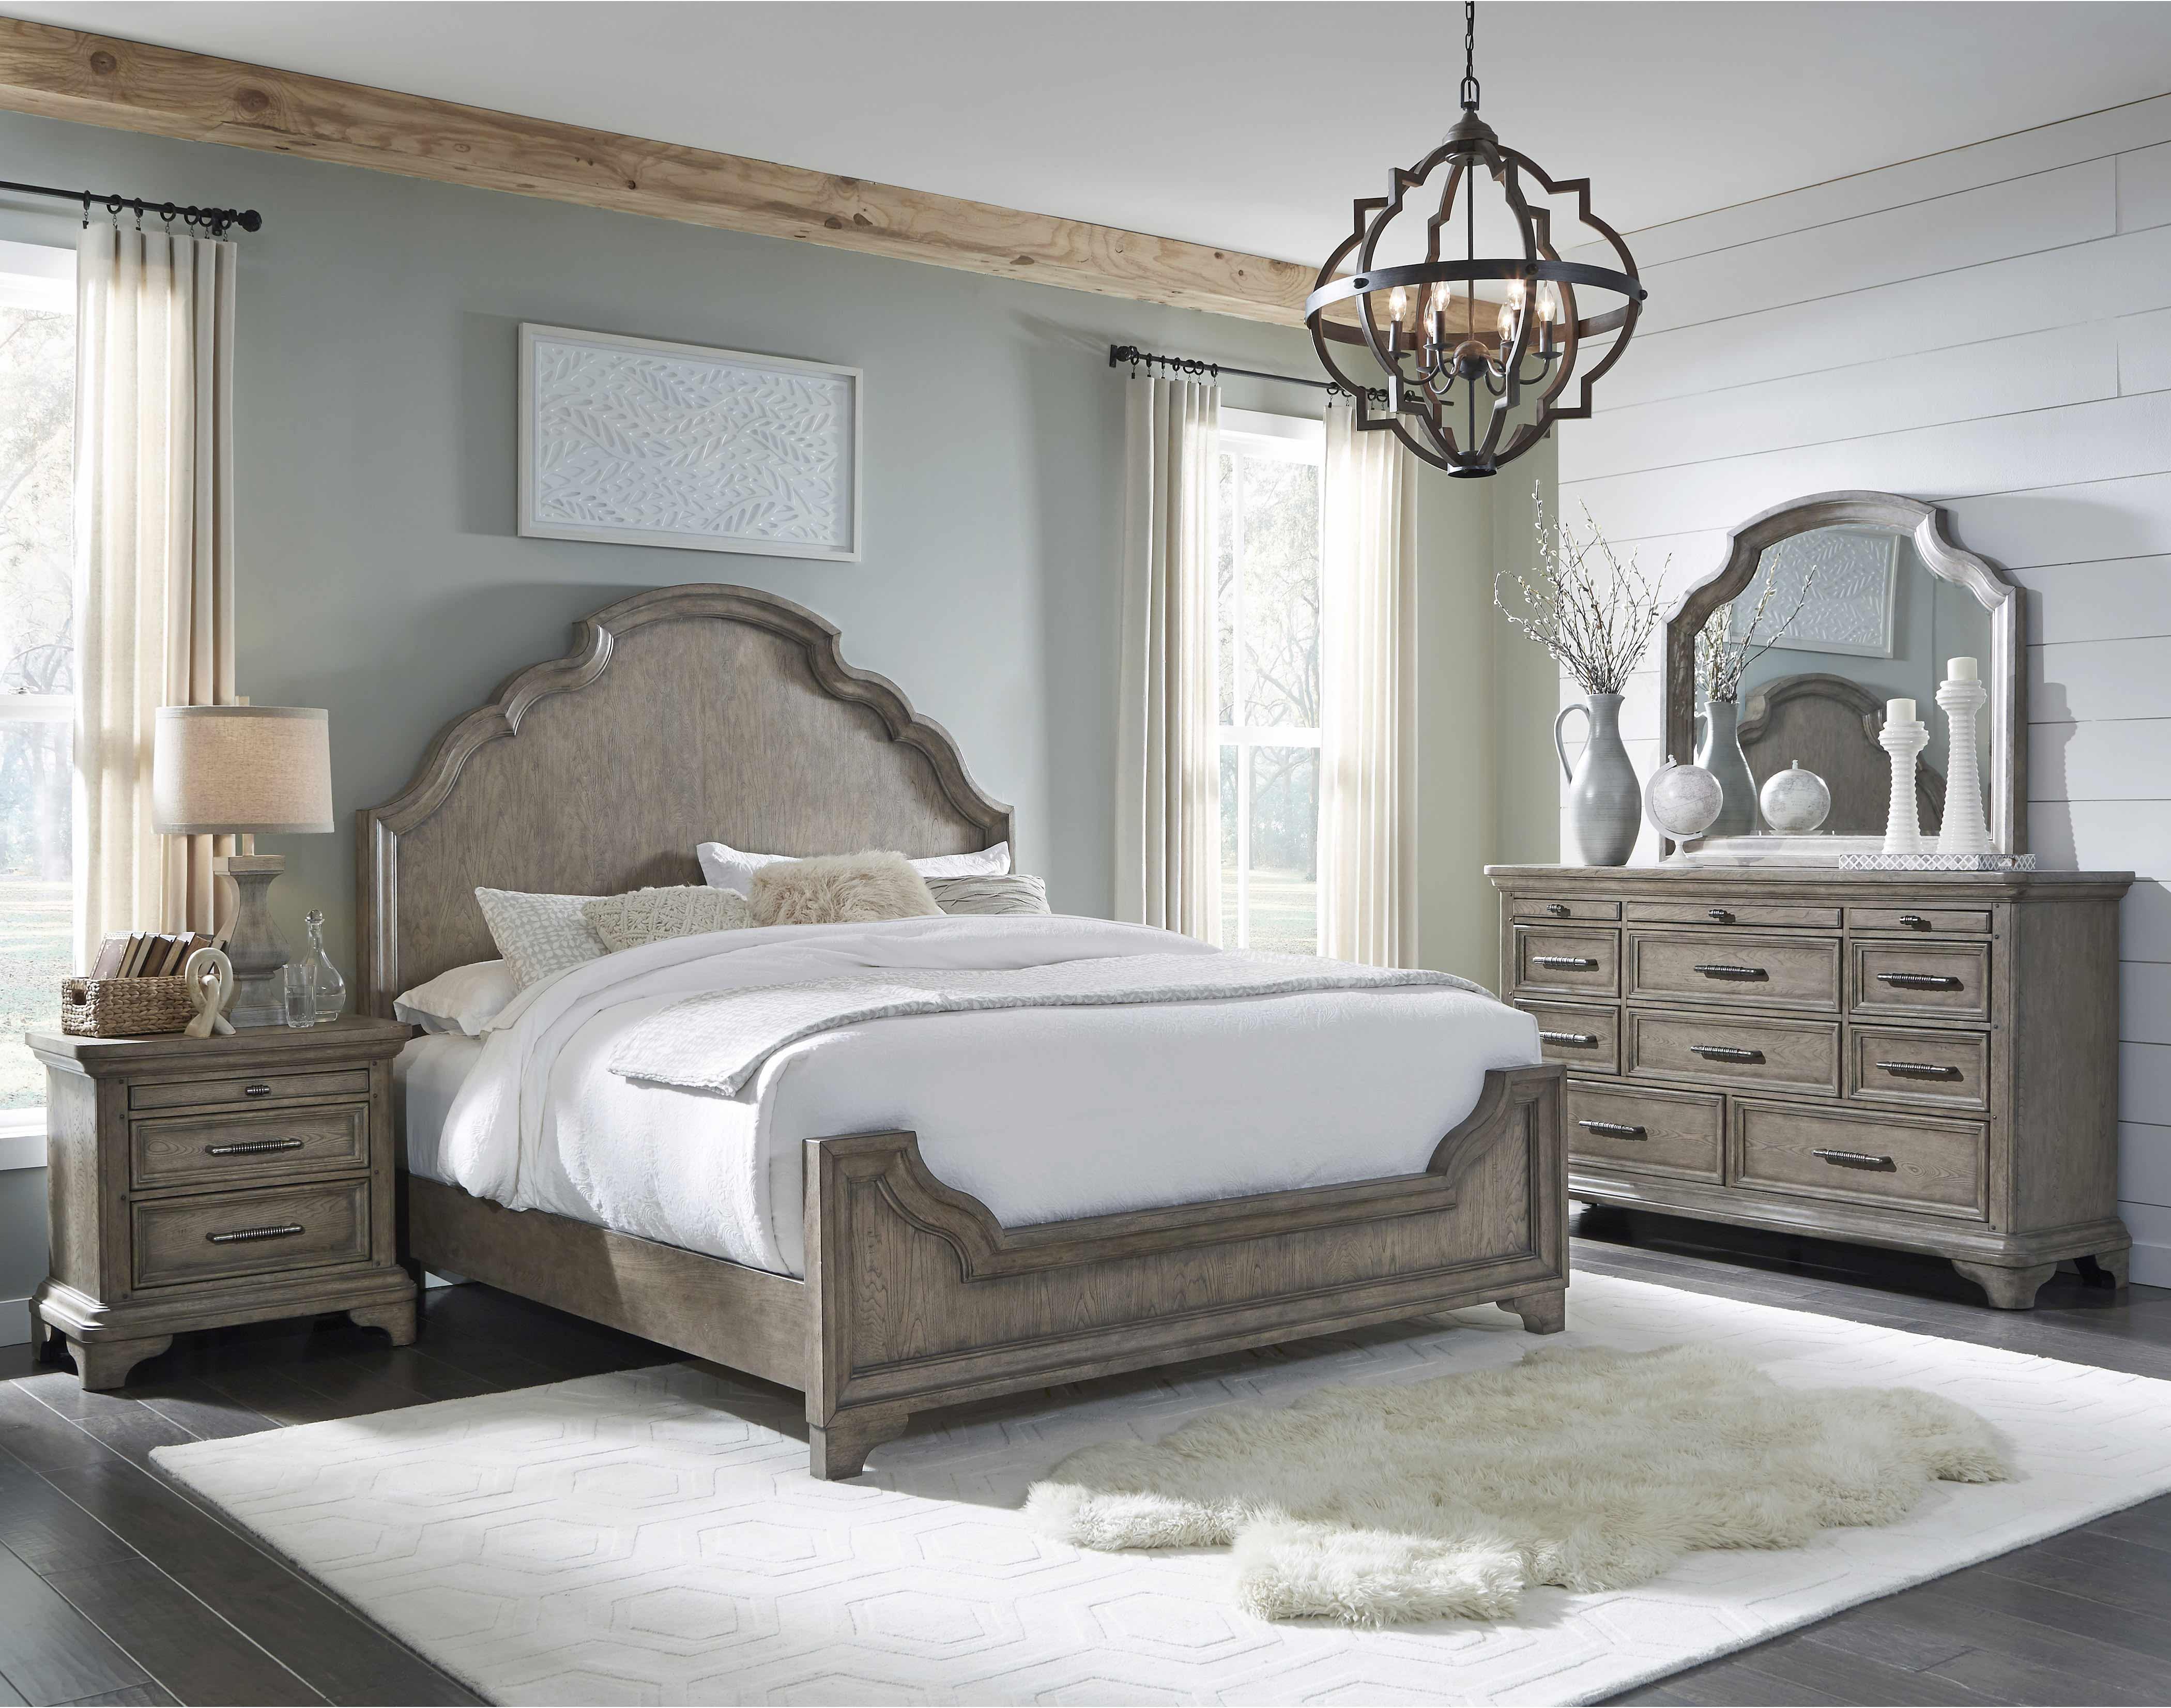 Sale Pulaski Furniture Bristol Panel Bedroom Set In Grey Brown